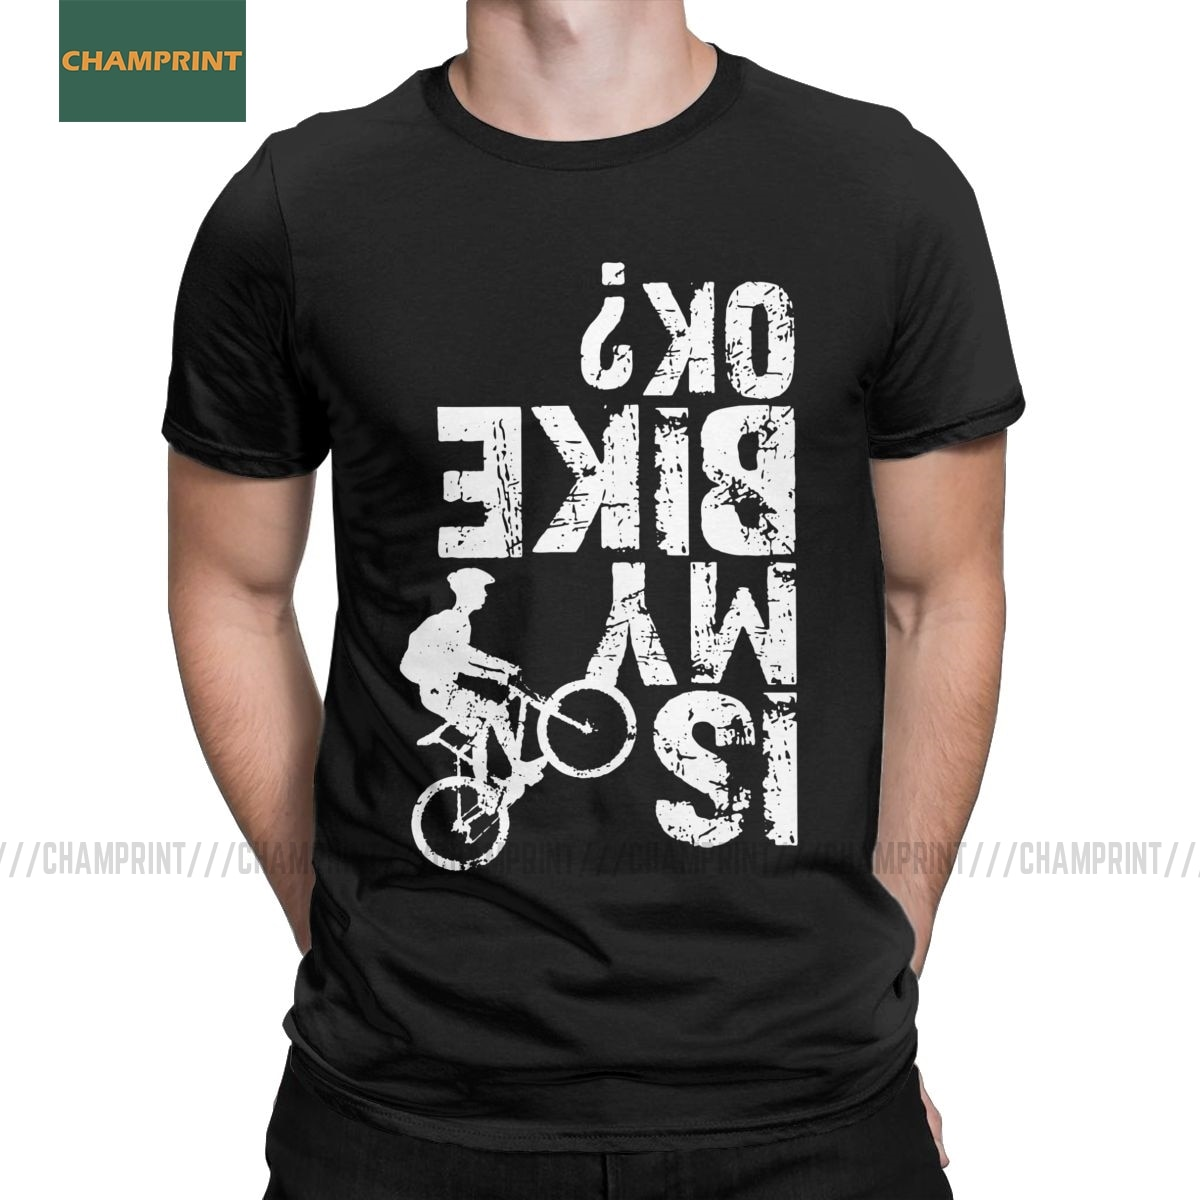 Es mi bicicleta Ok estilo agobiado tipografía ciclismo bicicleta de montaña Camiseta de algodón para hombres camisetas de ciclismo Mtb ciclismo paseo camisetas de talla grande